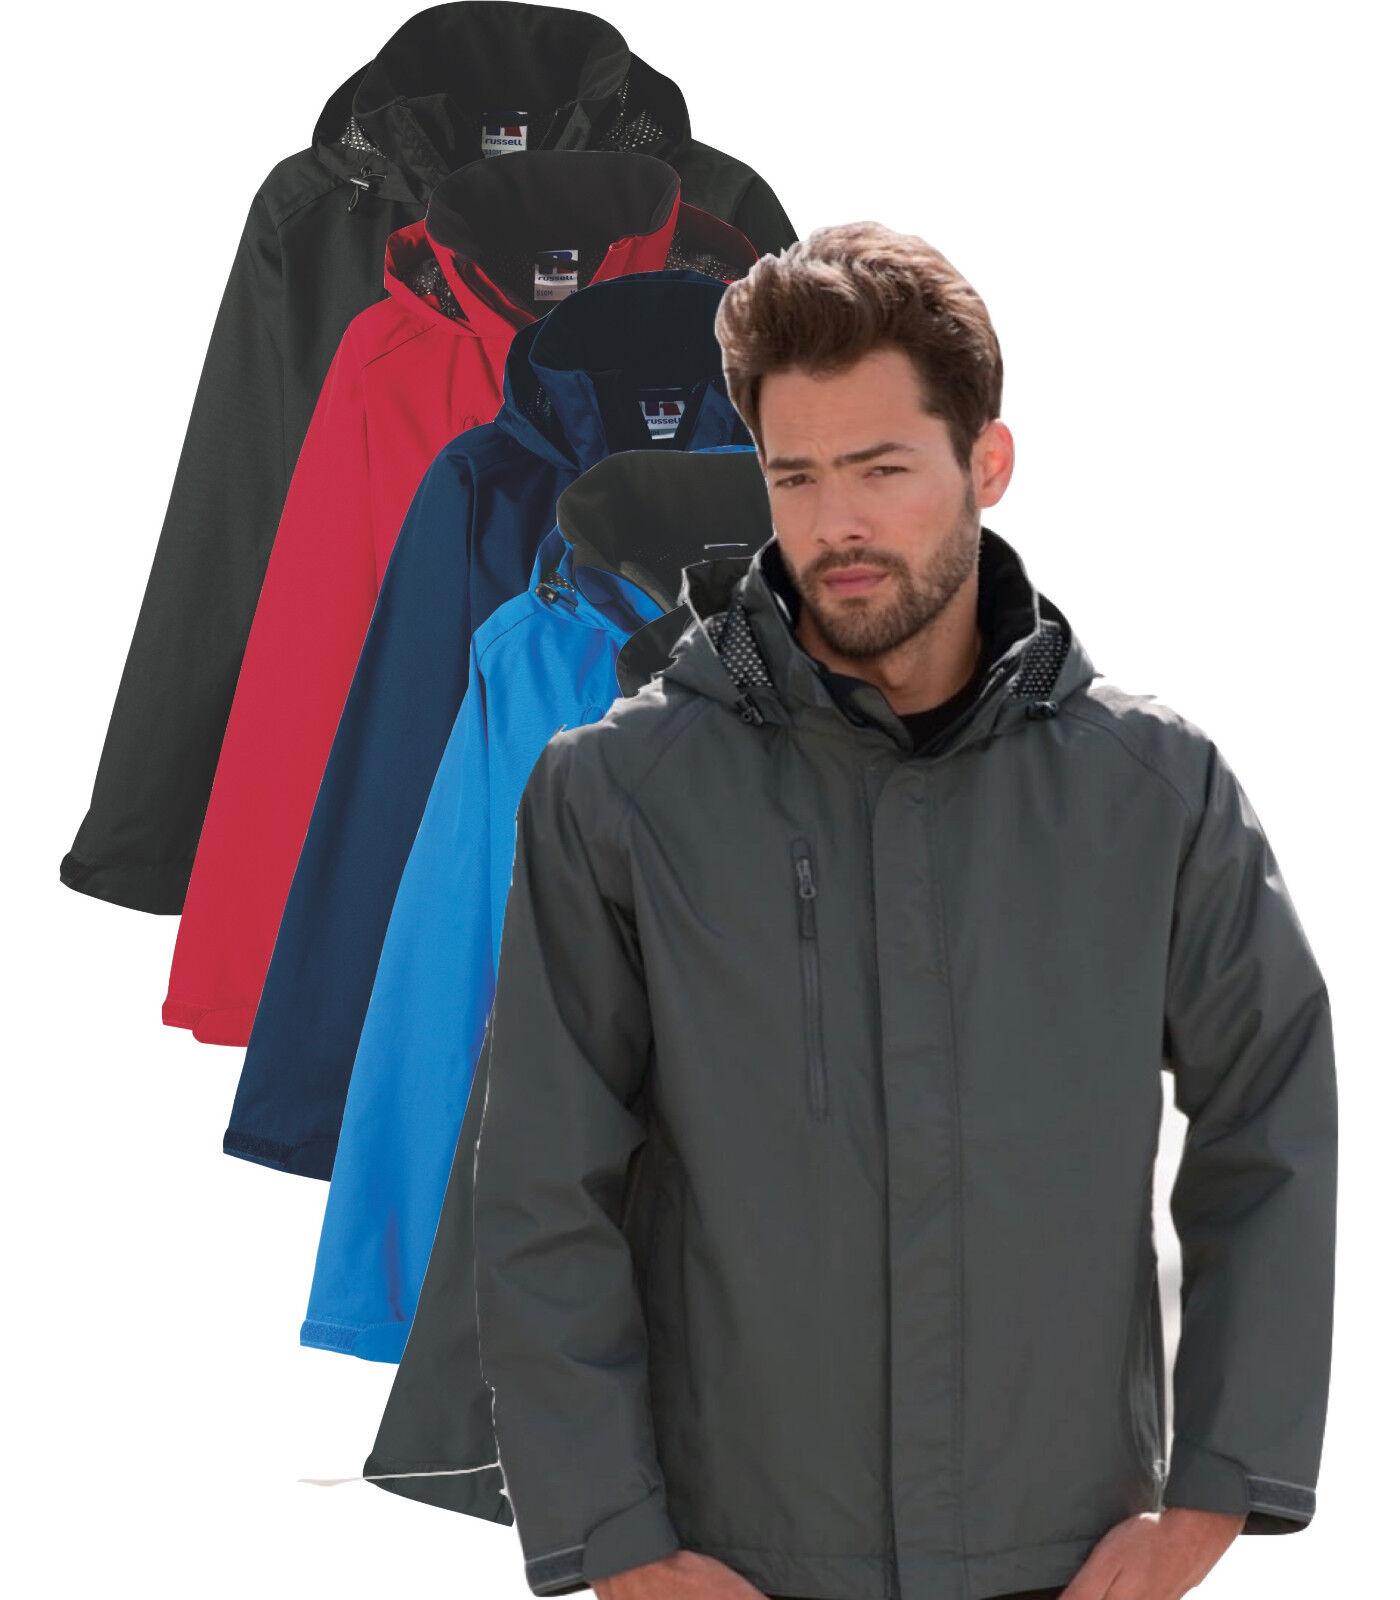 Russell 510M Mens Hydraplus 2000 Jacket Raincoat Water Resistance Winter Coat